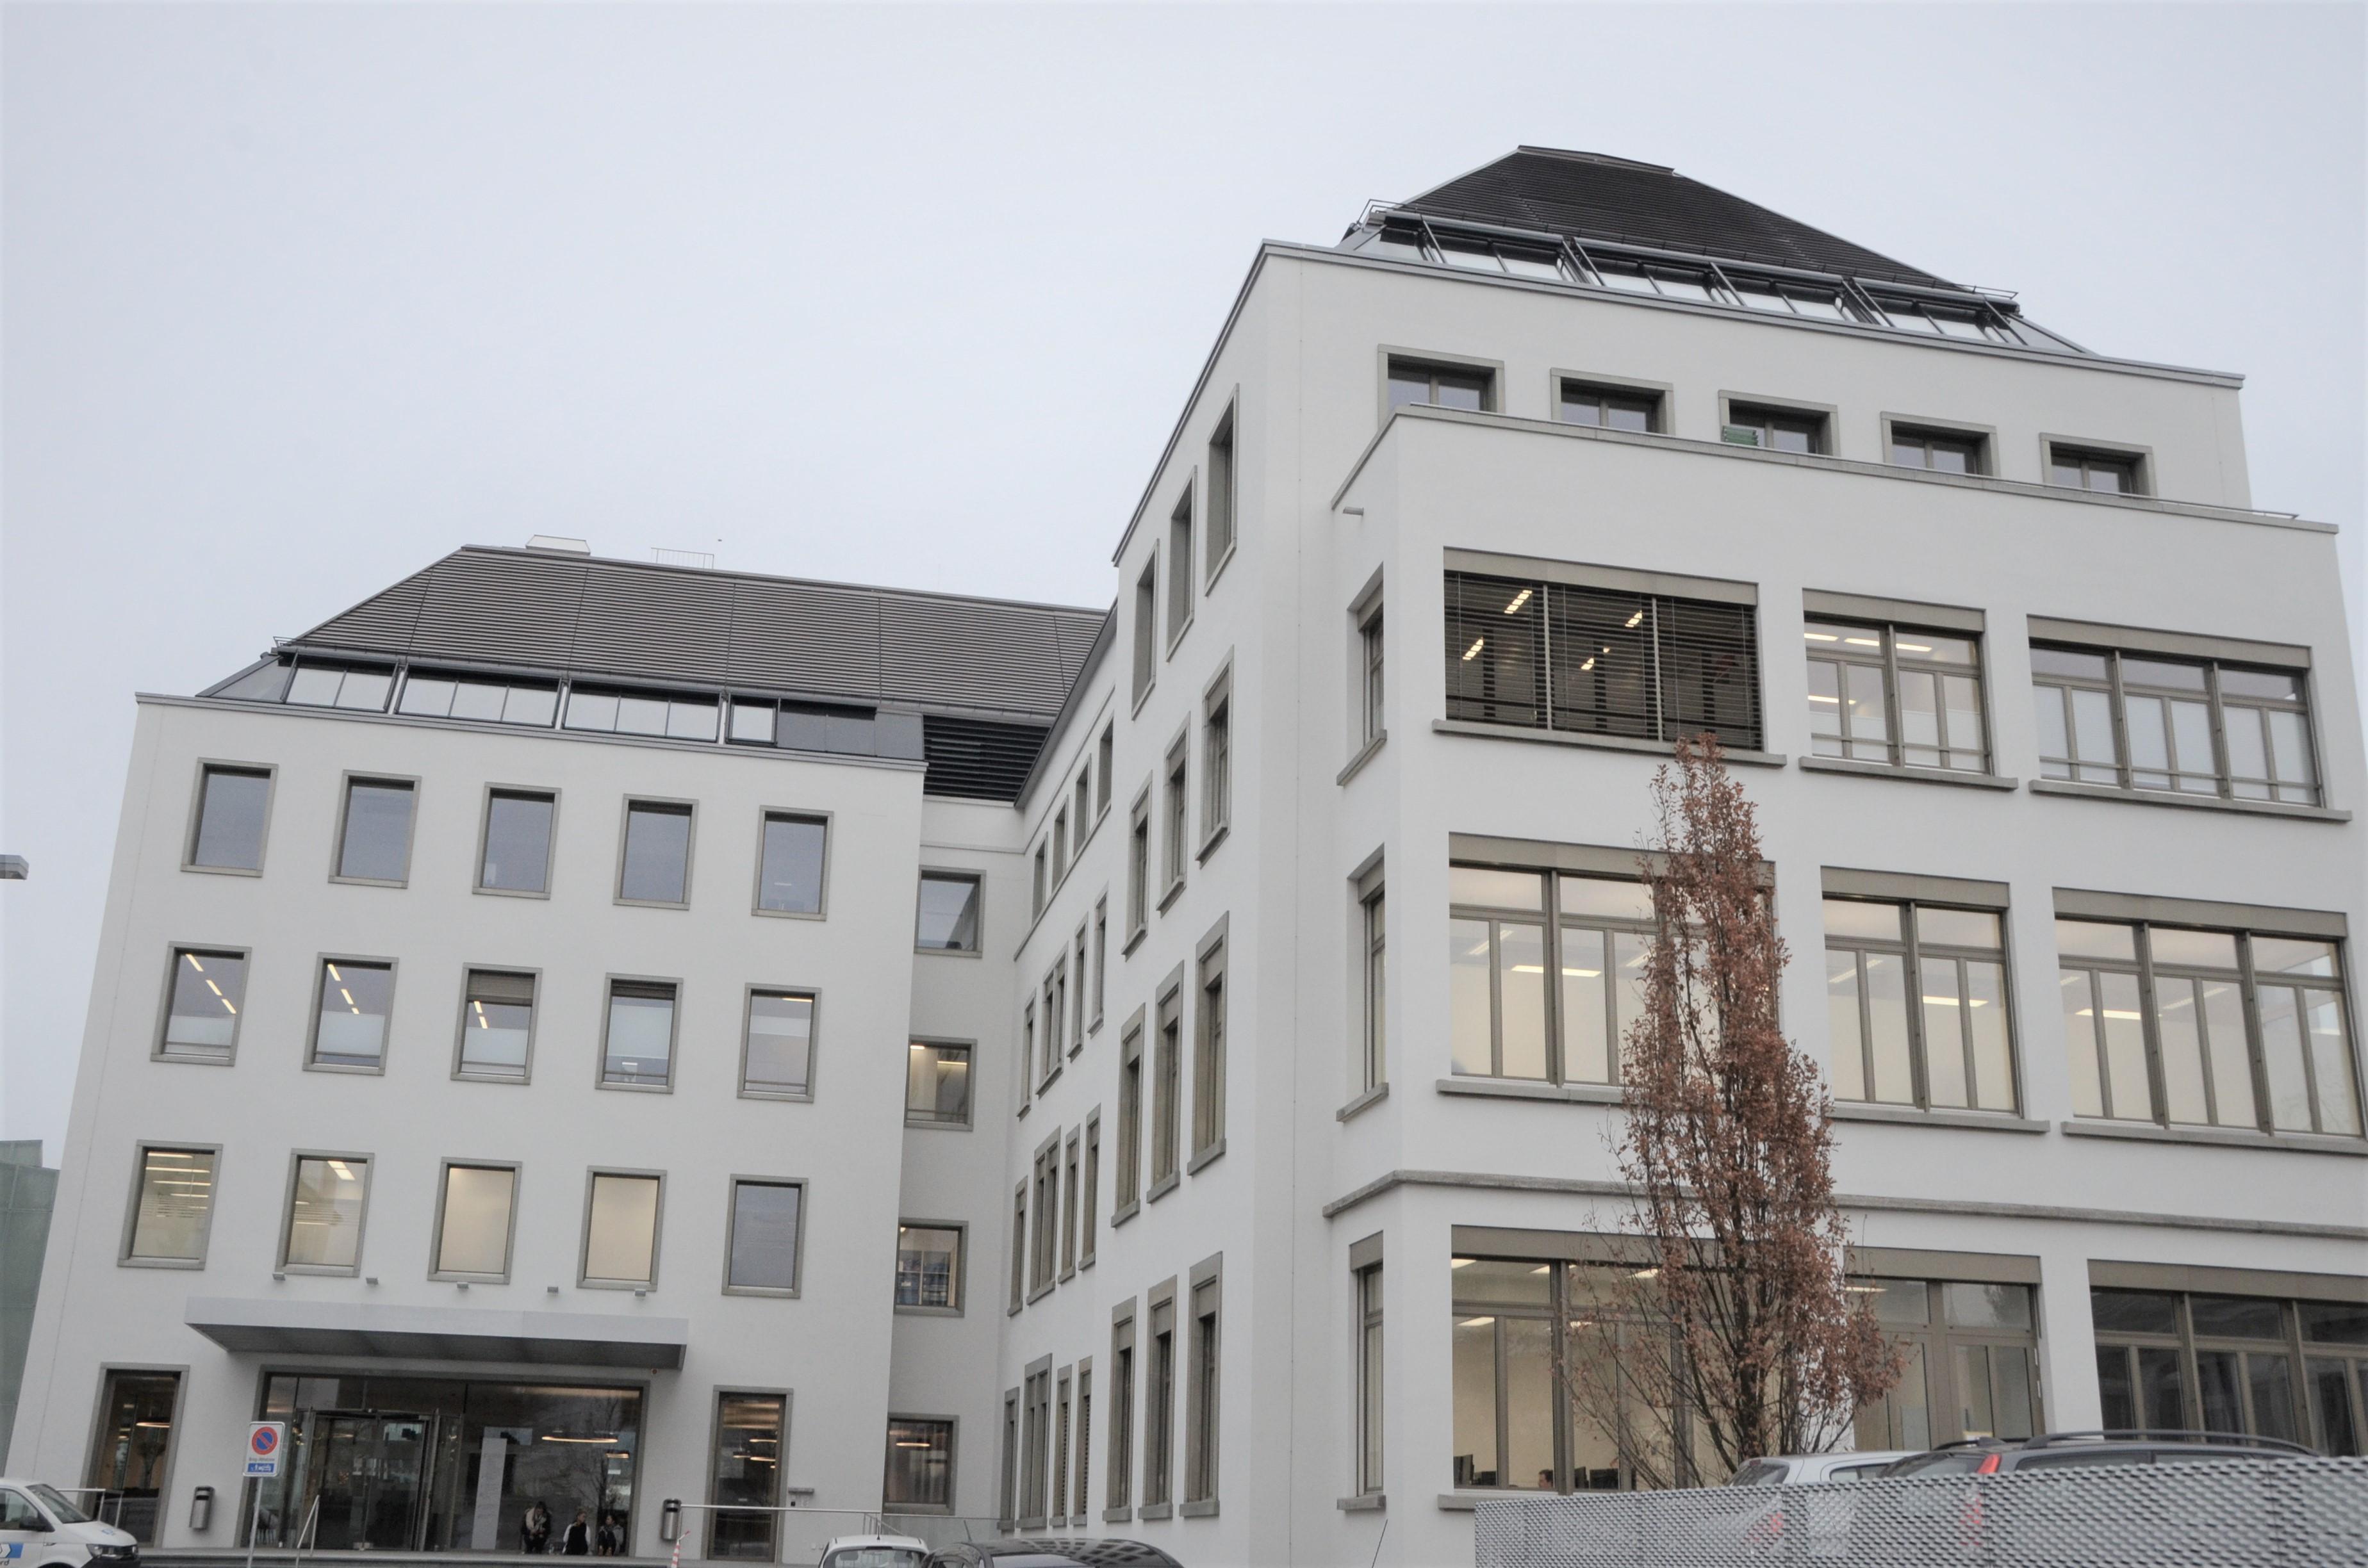 2018 Luzern Kantonsspital